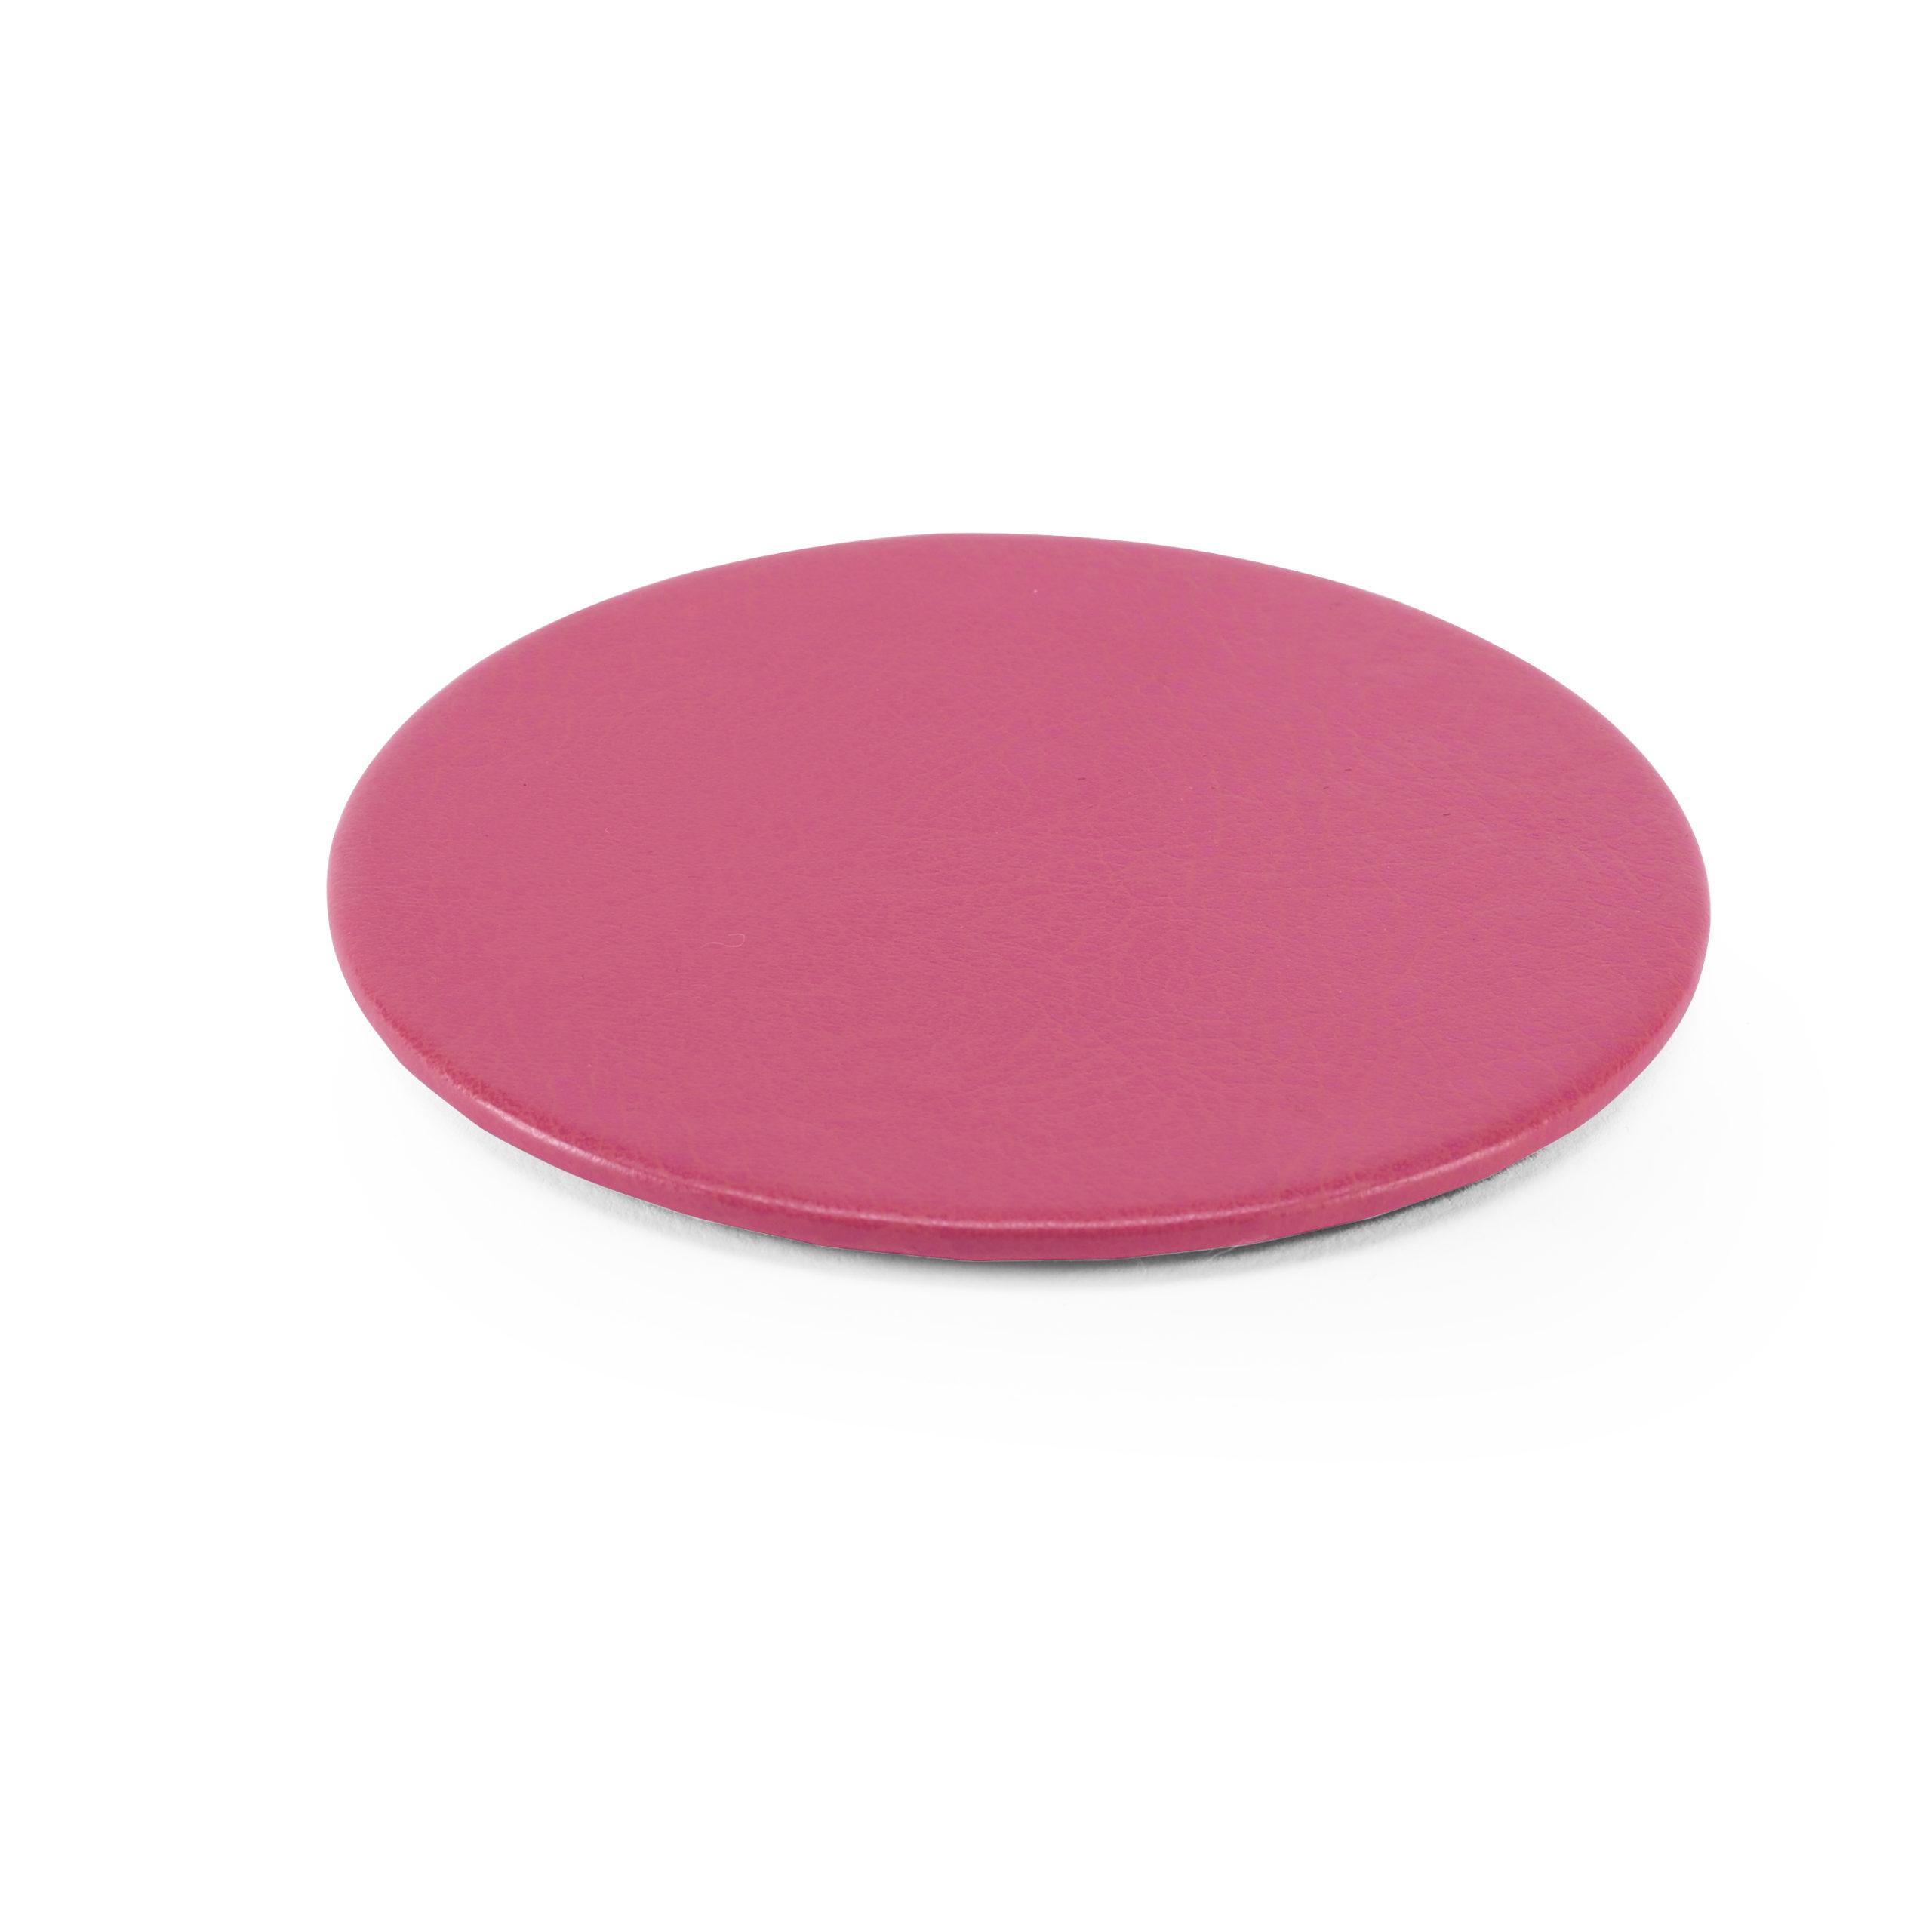 Lifestyle Round Coaster in Pink